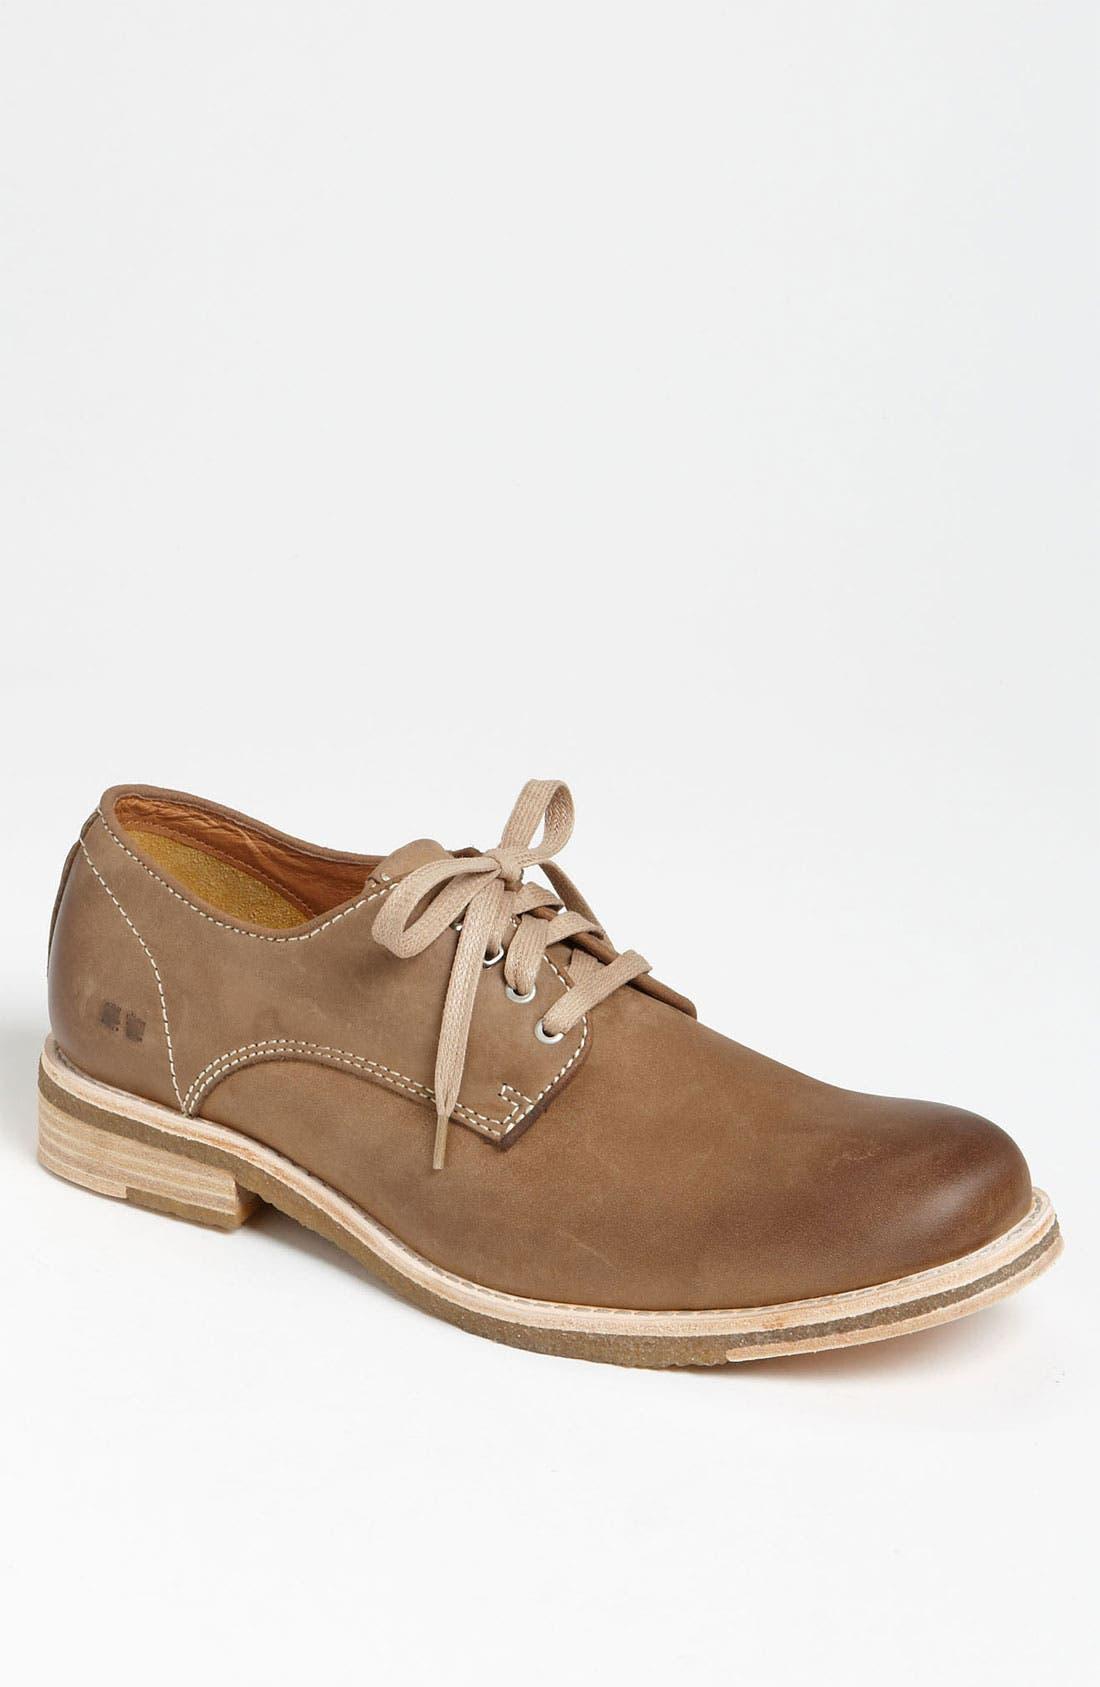 Main Image - Bed Stu 'Pennyworth' Buck Shoe